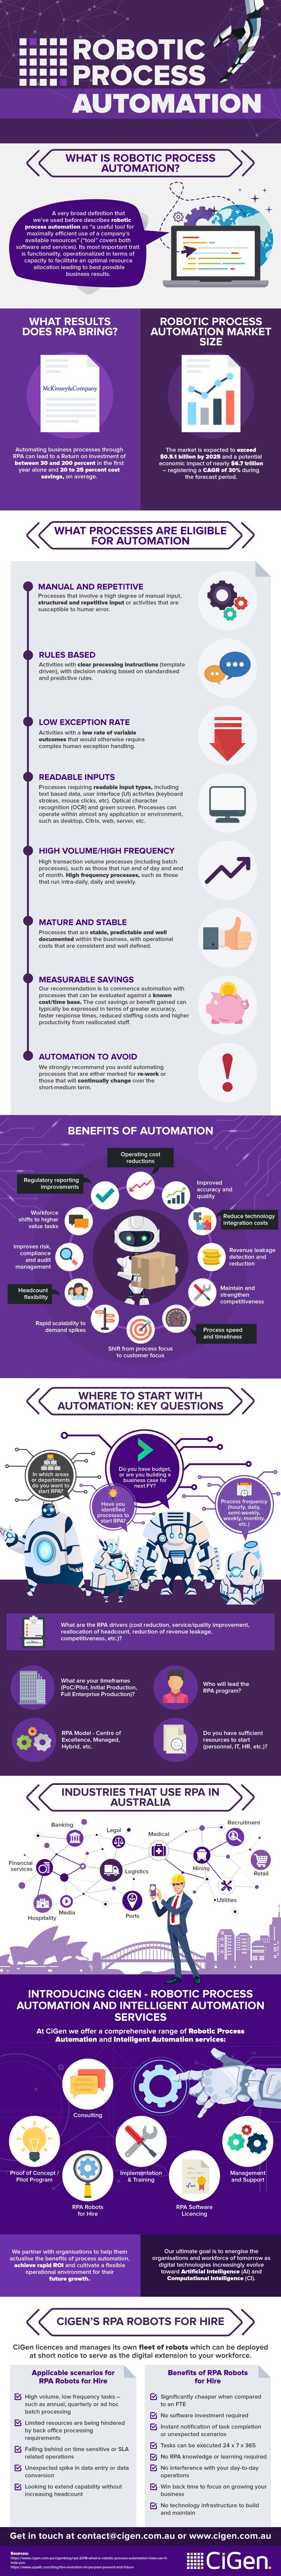 CiGen-RPA-infographic-what-is-robotic-process-automation-2018